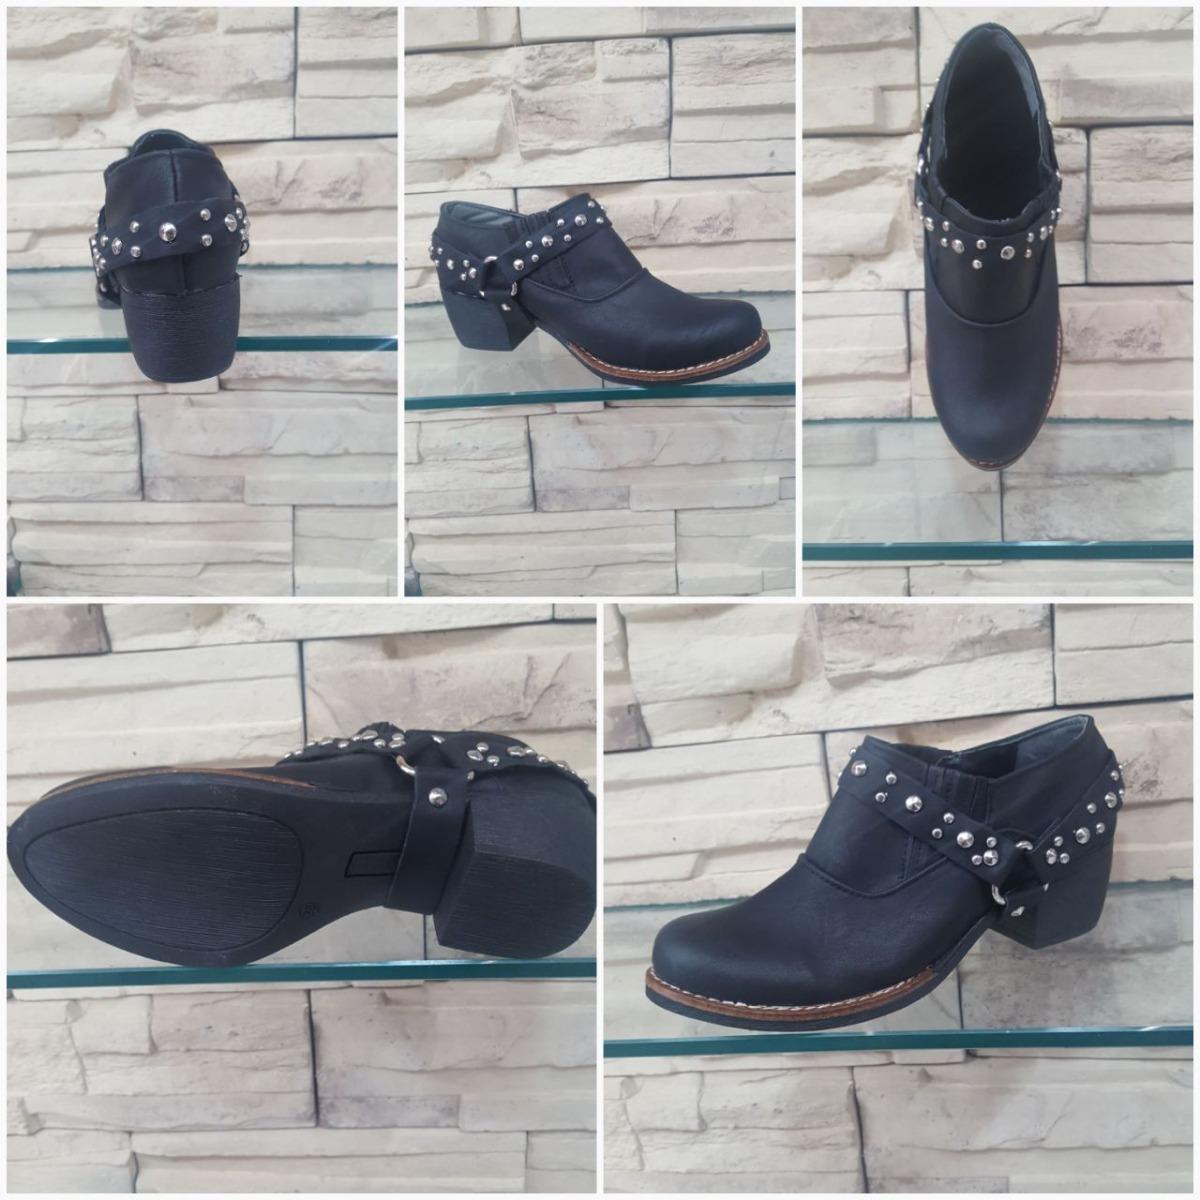 Texano X Pack 12 Moda Pares Mujer Zapatos Charrito Tachas Tcl1FKJ